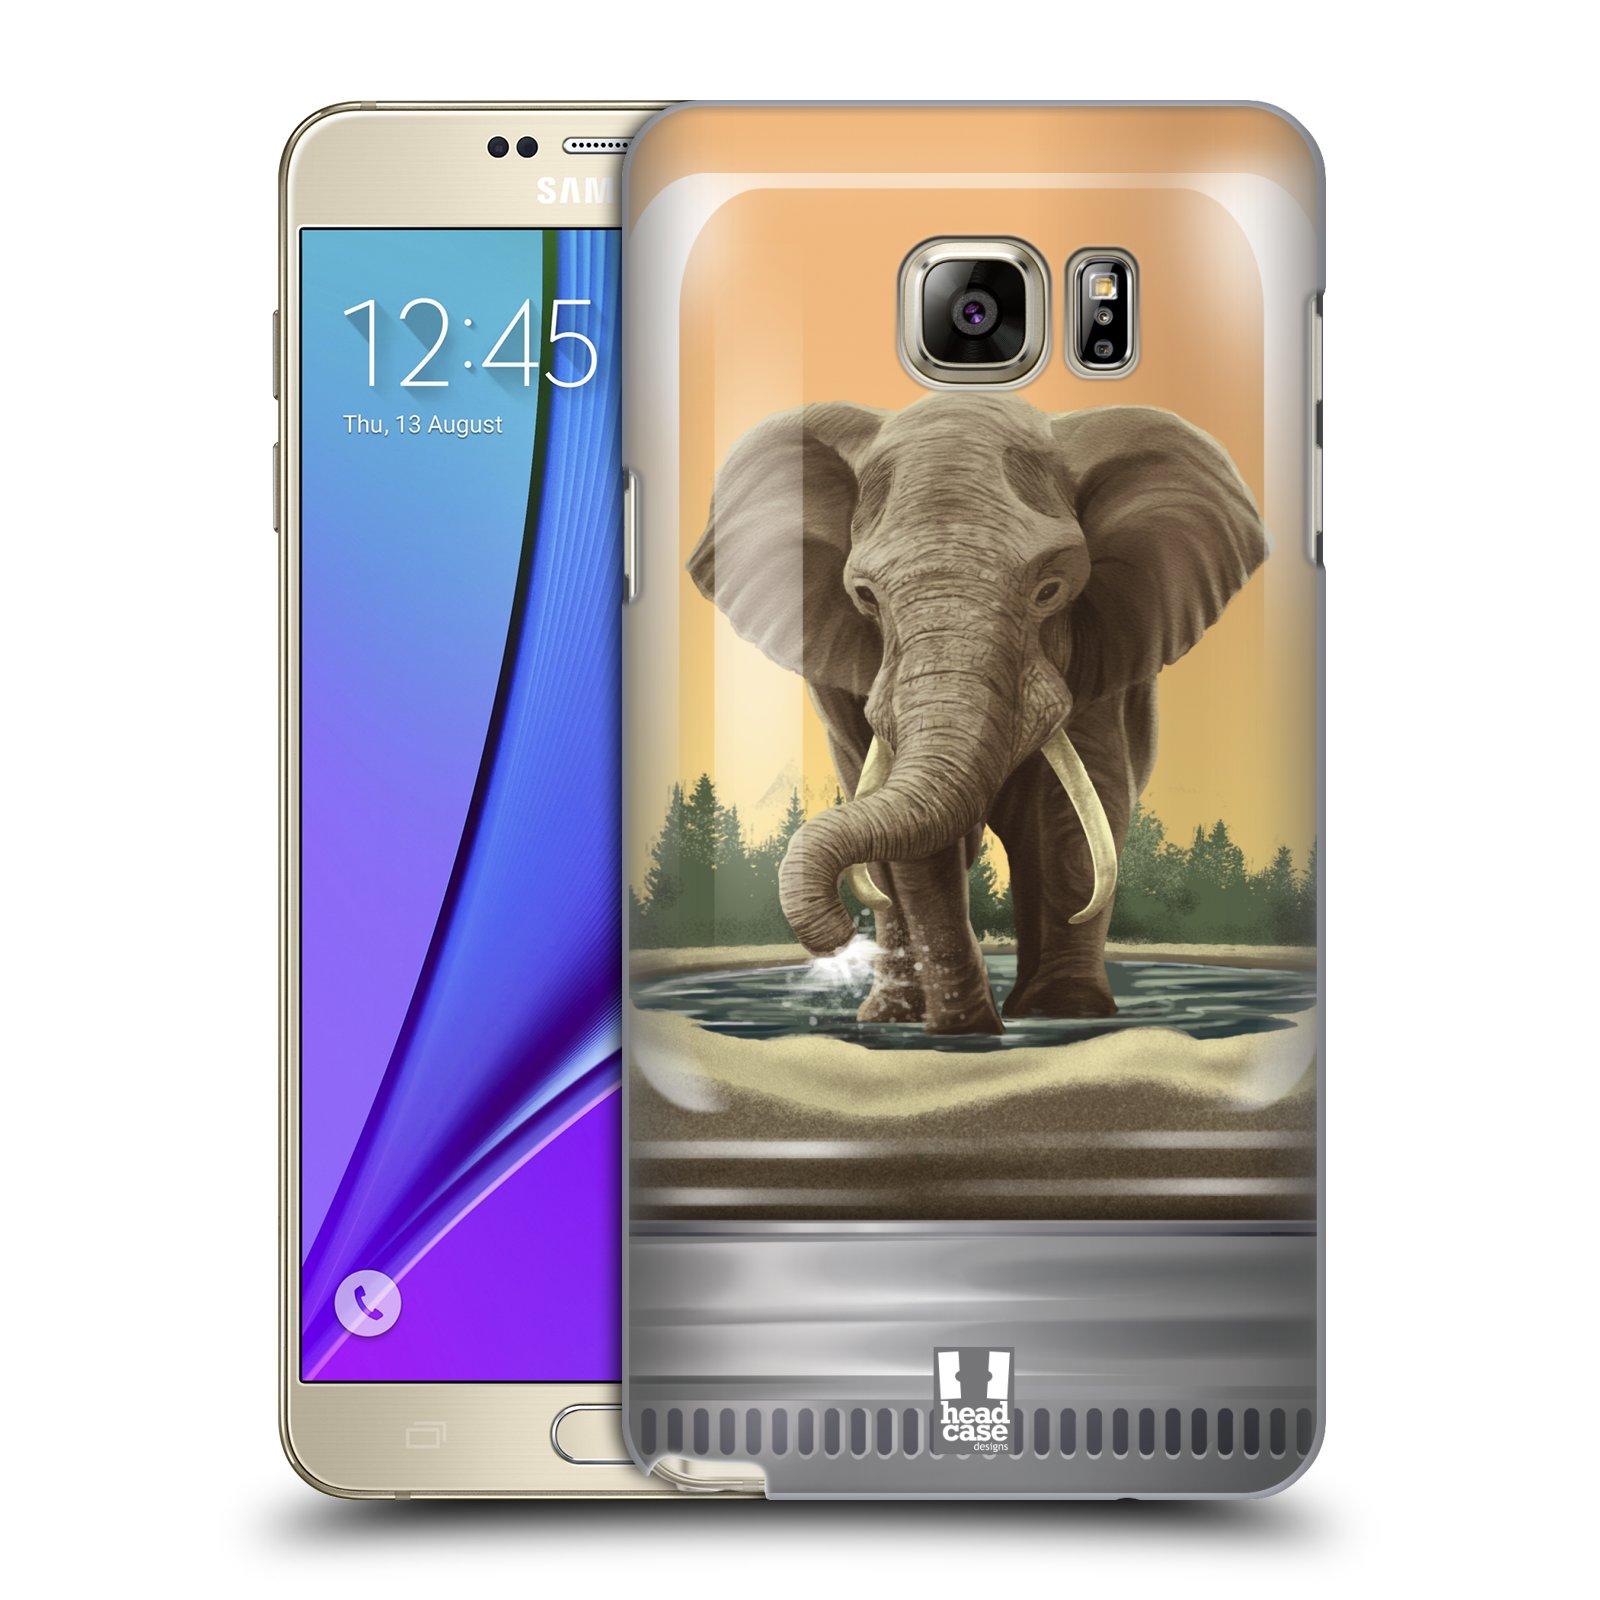 HEAD CASE plastový obal na mobil SAMSUNG Galaxy Note 5 (N920) vzor Zvířátka v těžítku slon